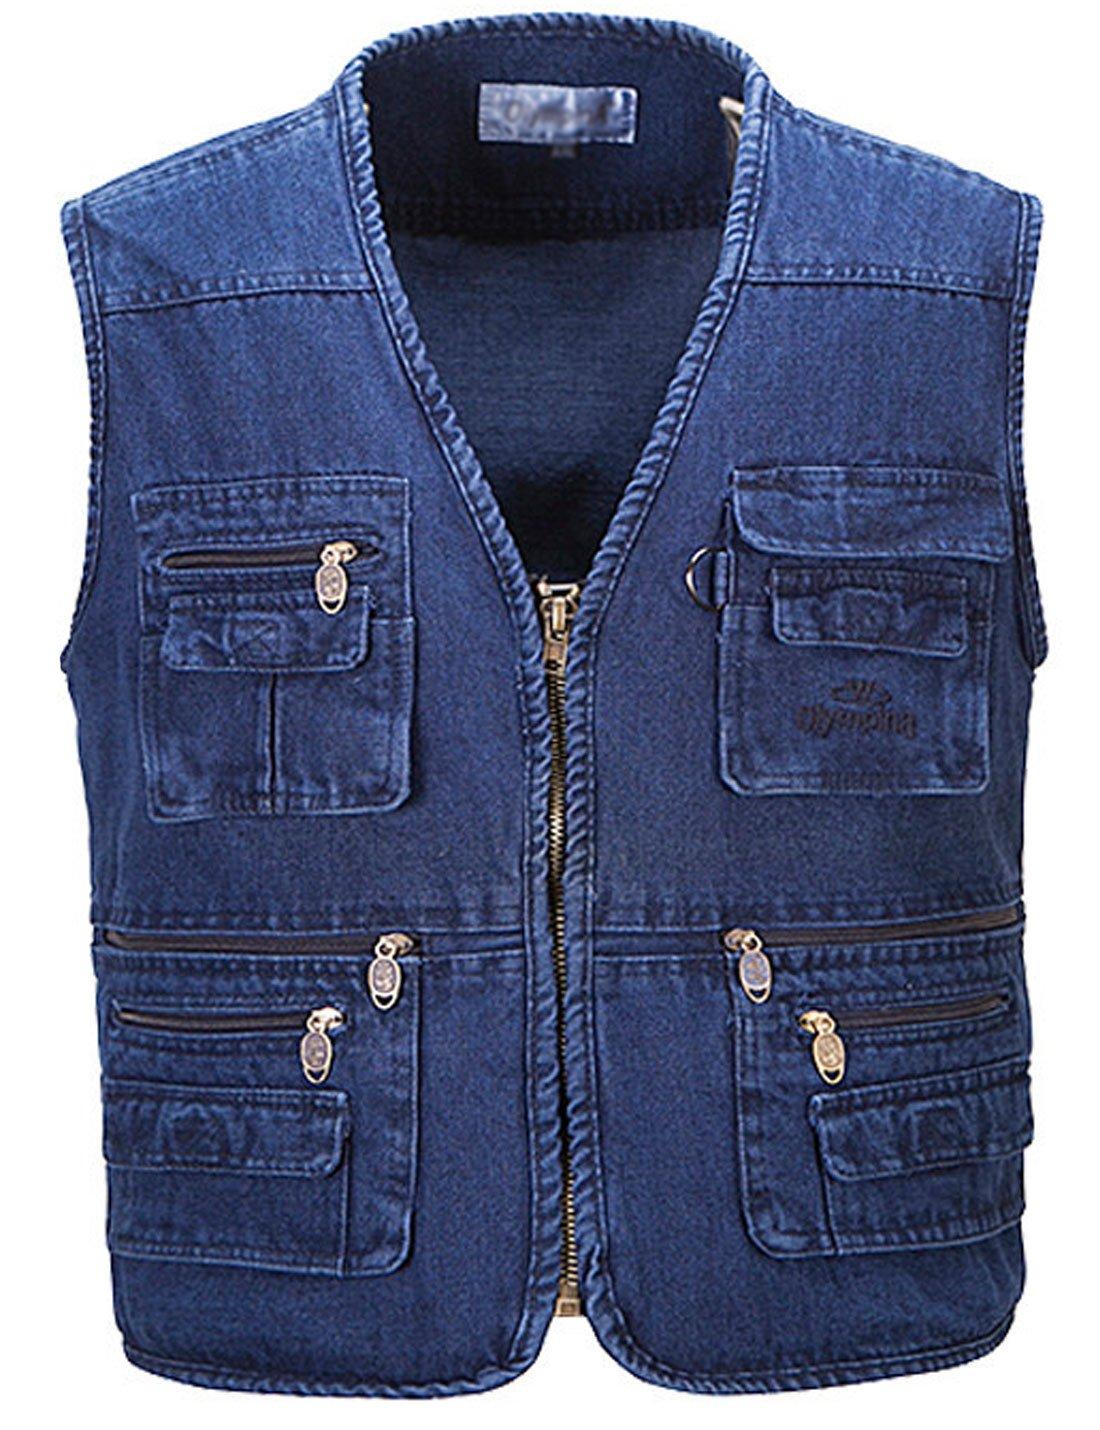 Yeokou Men's Casual Denim Blue Jean Cargo Vest Short Work Vest Multi Pockets (XX-Large, Denim Blue)